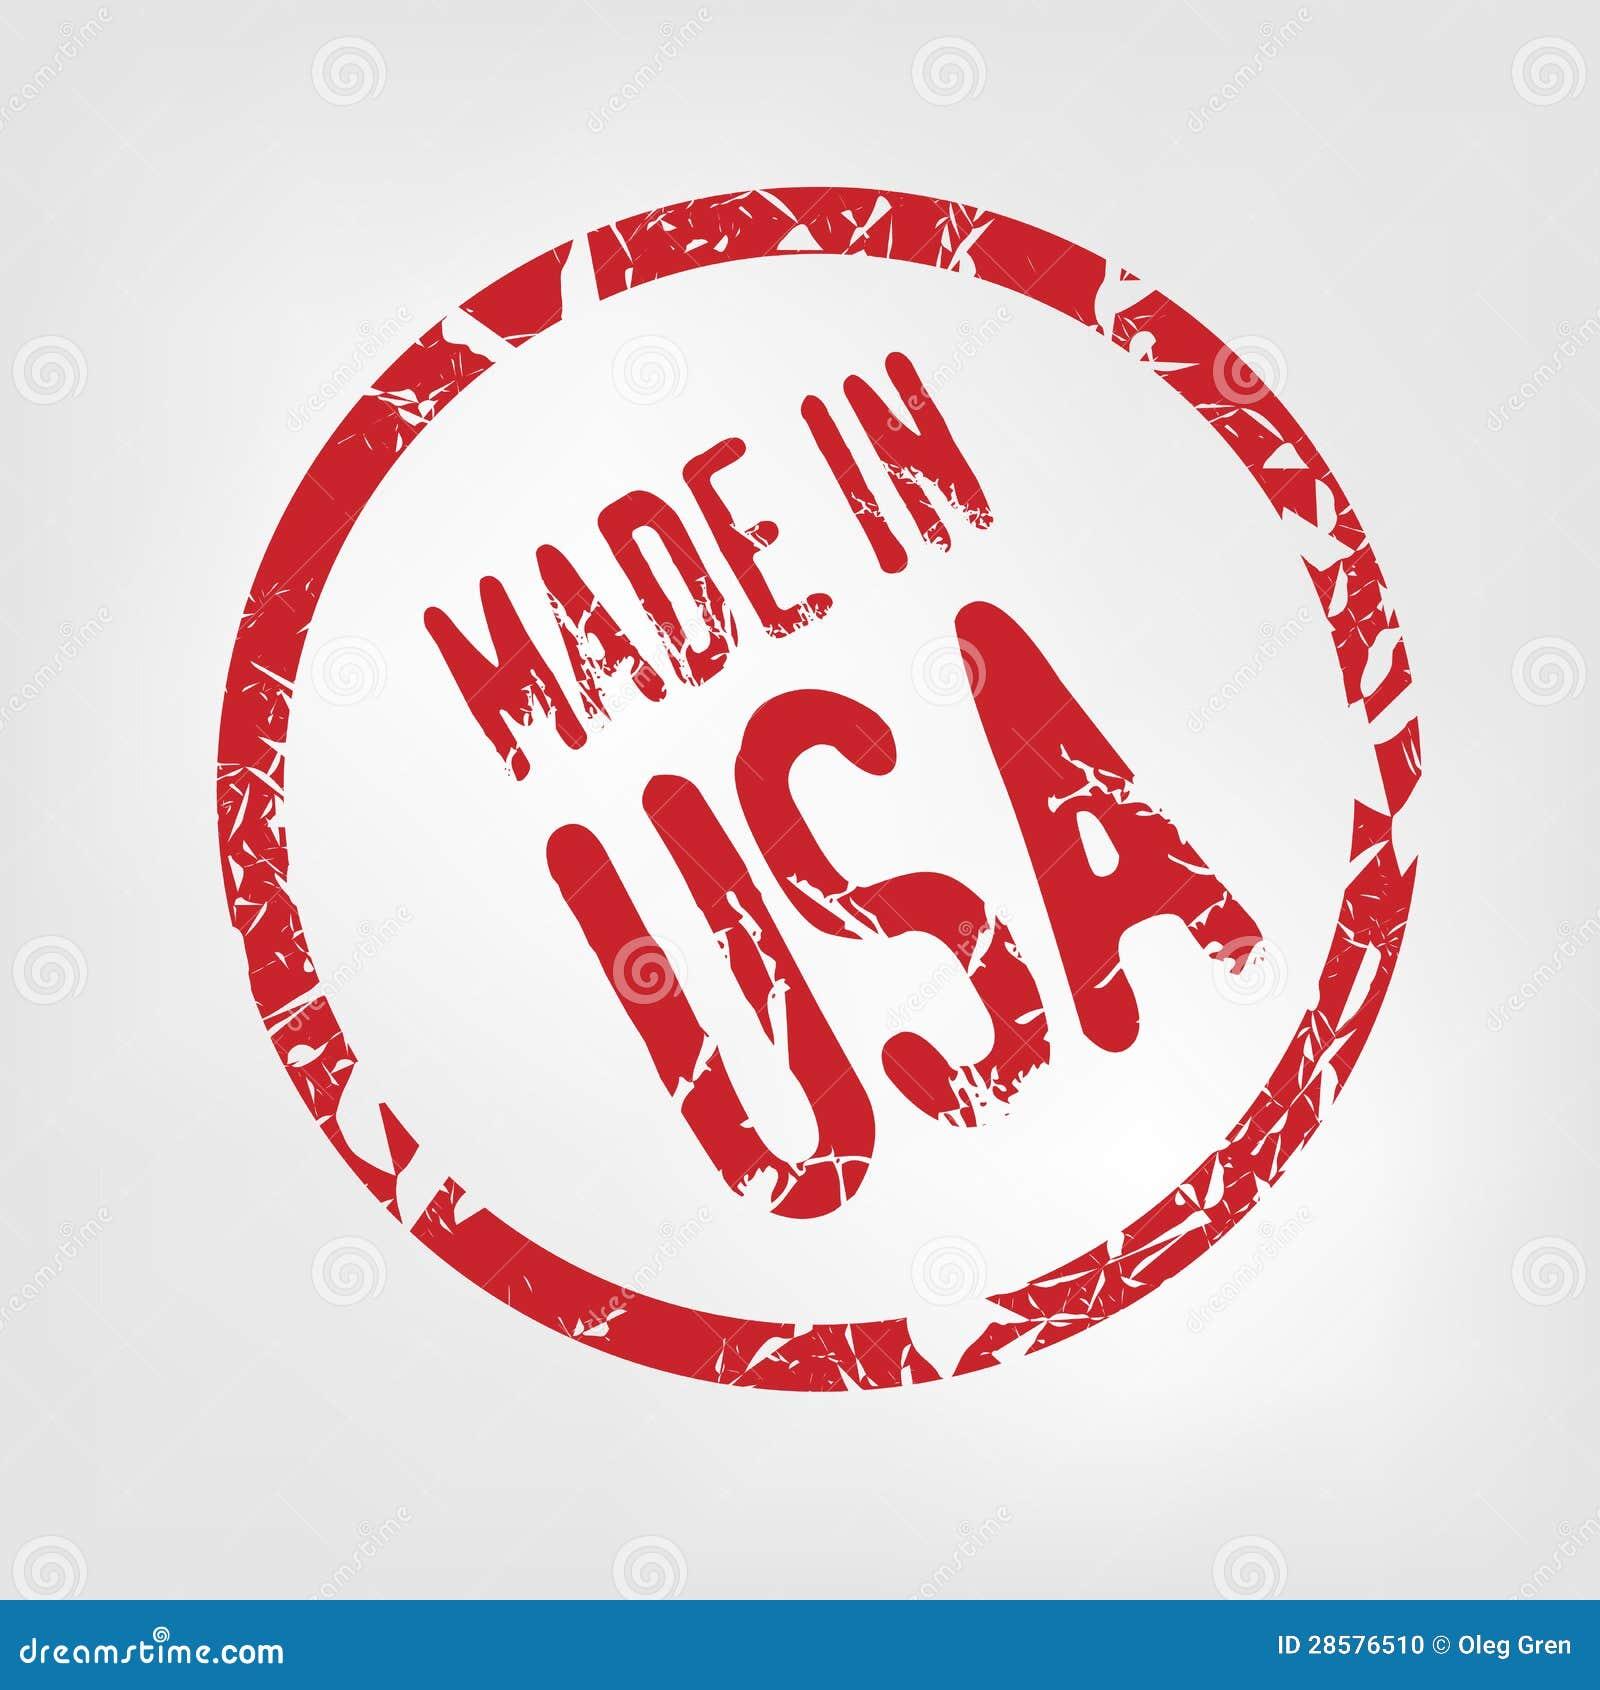 made in usa stamp stock vector illustration of america 28576510. Black Bedroom Furniture Sets. Home Design Ideas